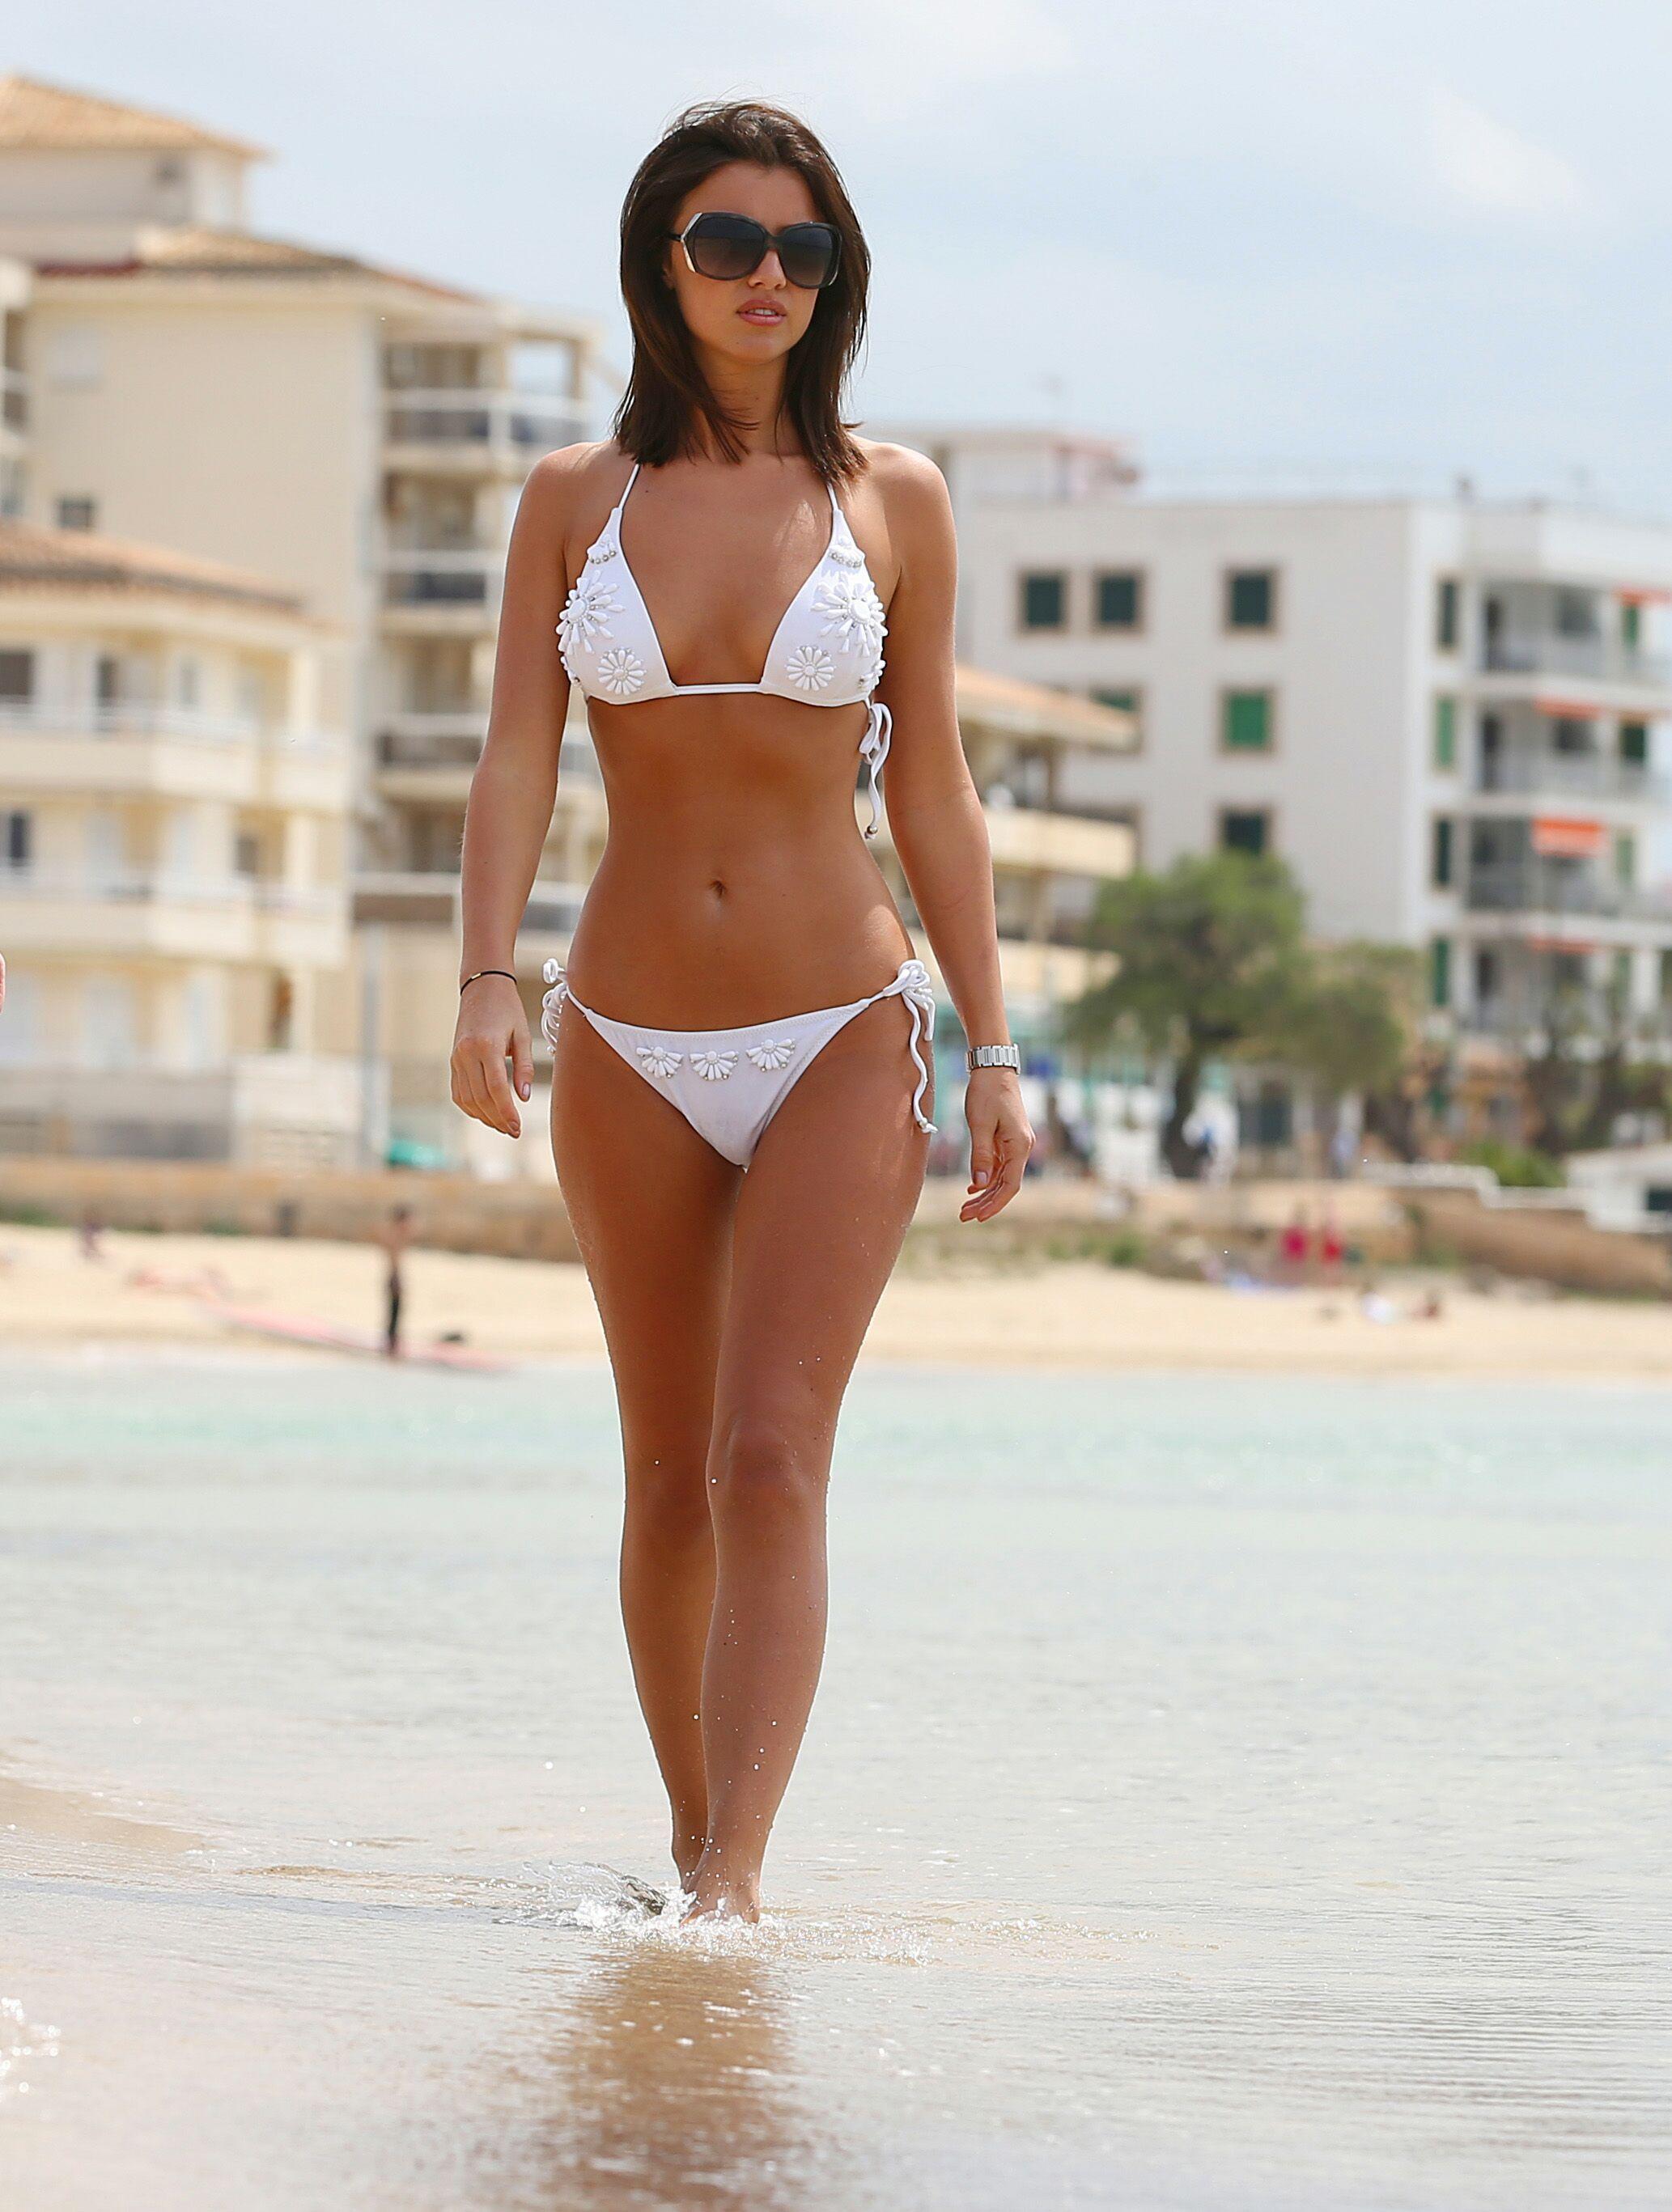 Hotshots itty bitty bikini contest, hairless girl fuck